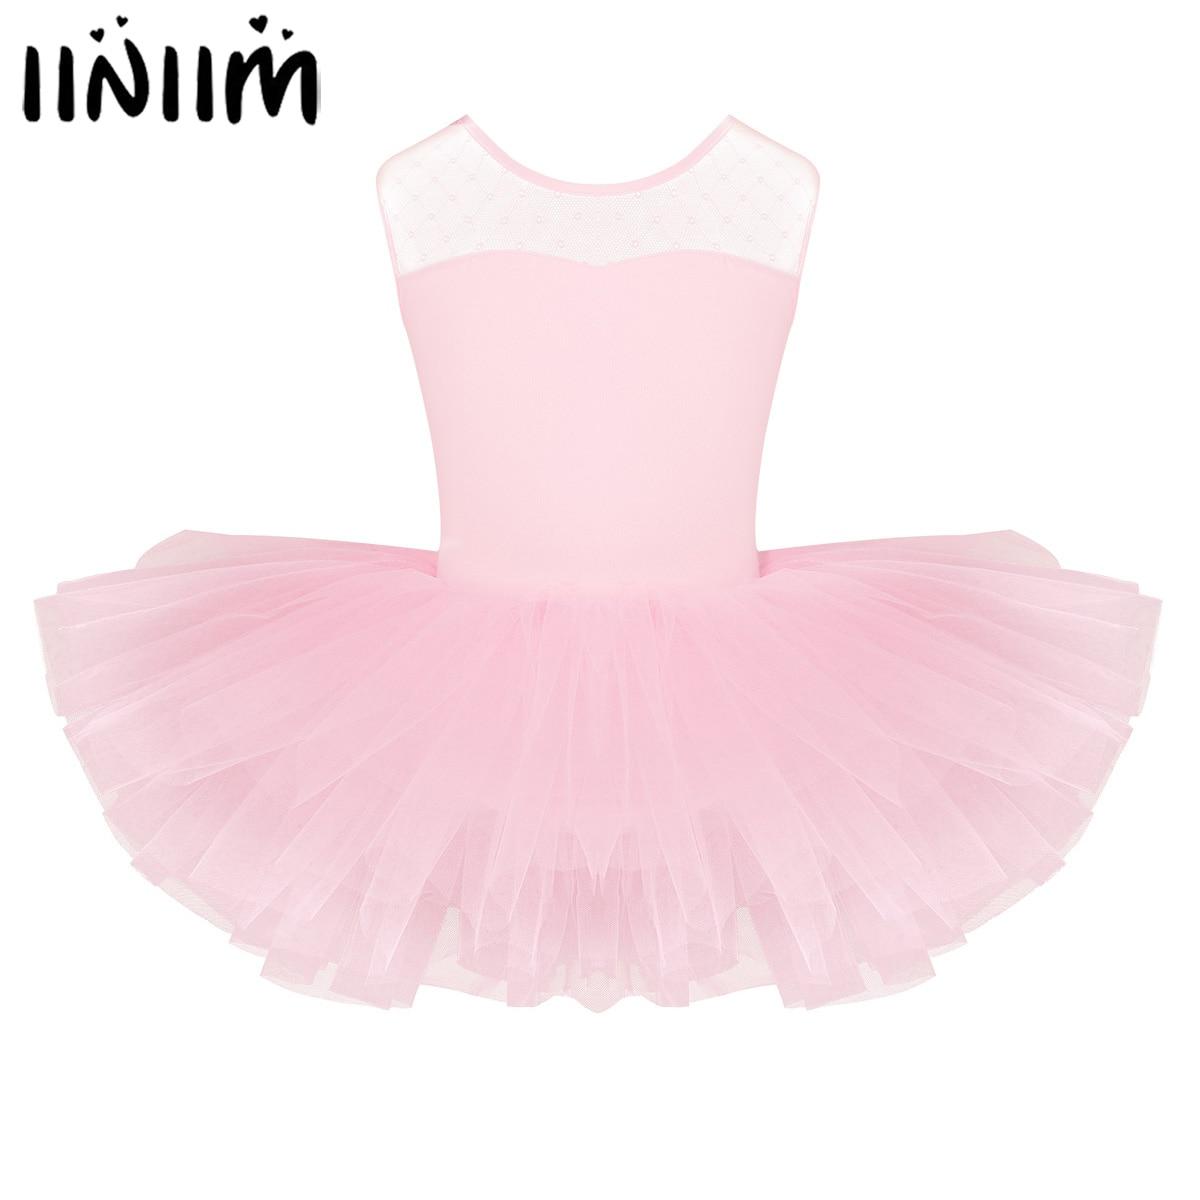 iiniim-kids-font-b-ballet-b-font-tutu-dress-dance-costumes-ballerina-mesh-splice-u-shaped-back-font-b-ballet-b-font-dancewear-gymnastics-leotard-girls-dress